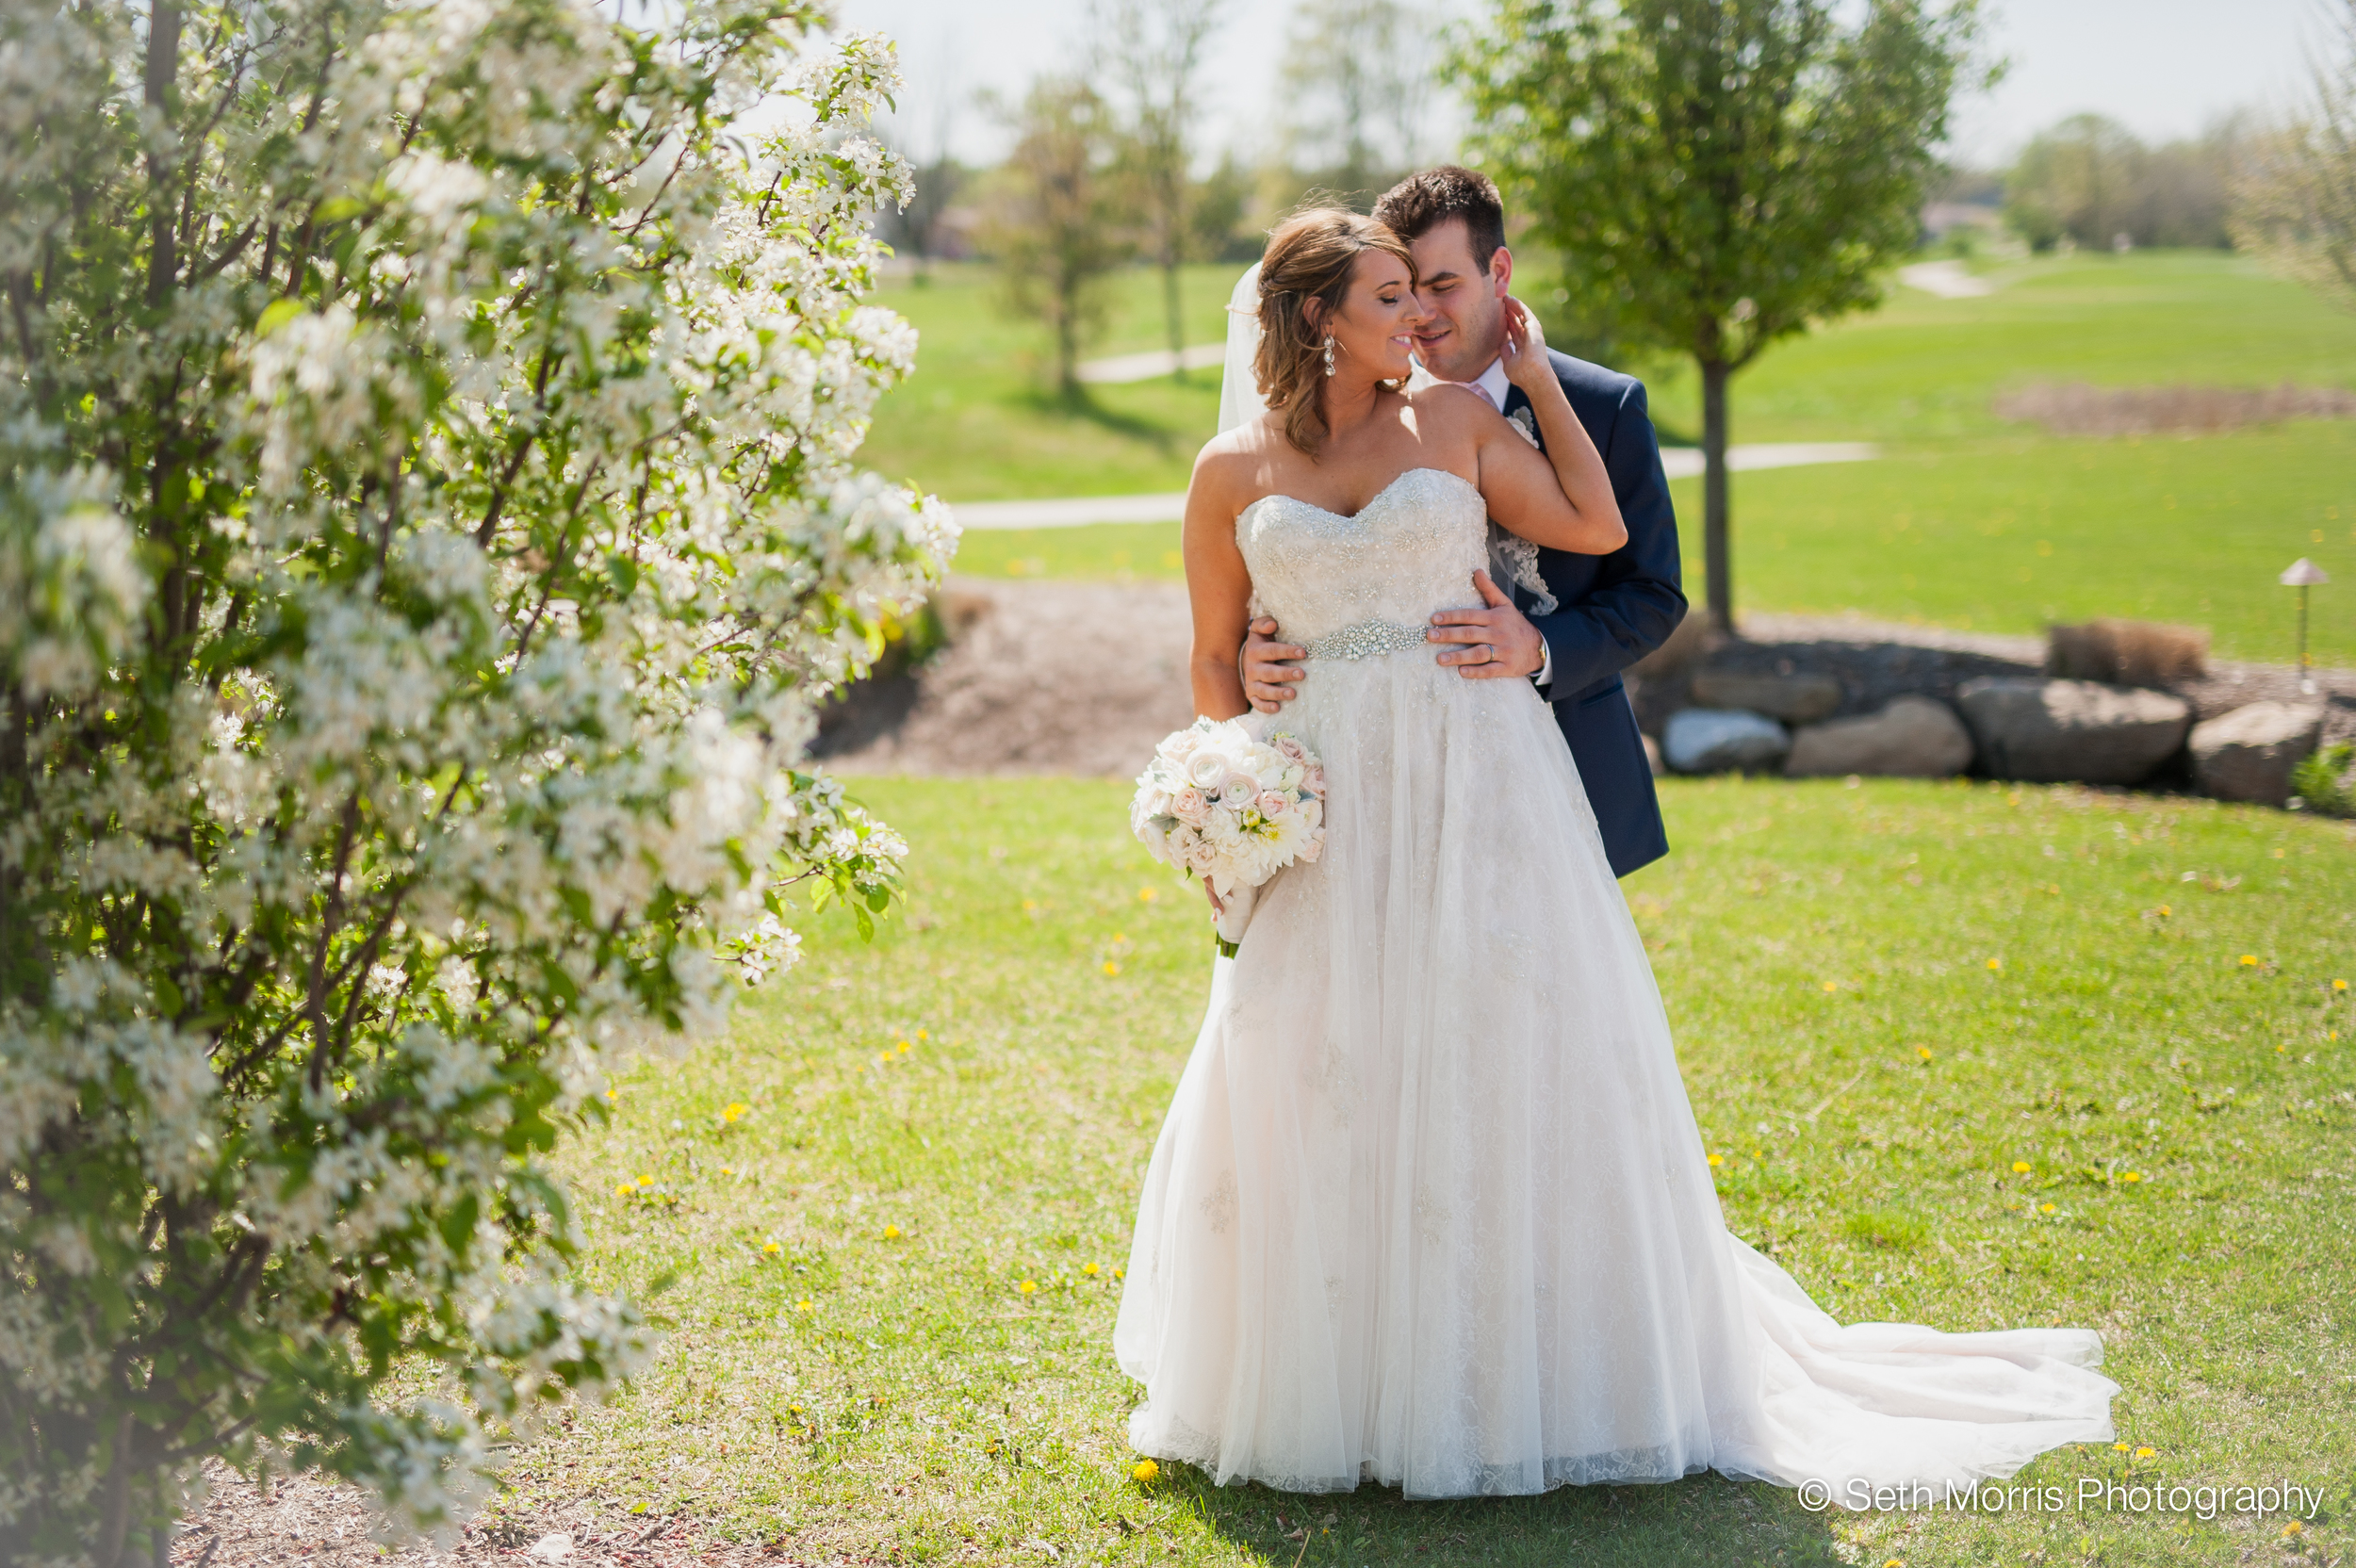 metamora-fields-wedding-photographer-peoria-117.jpg